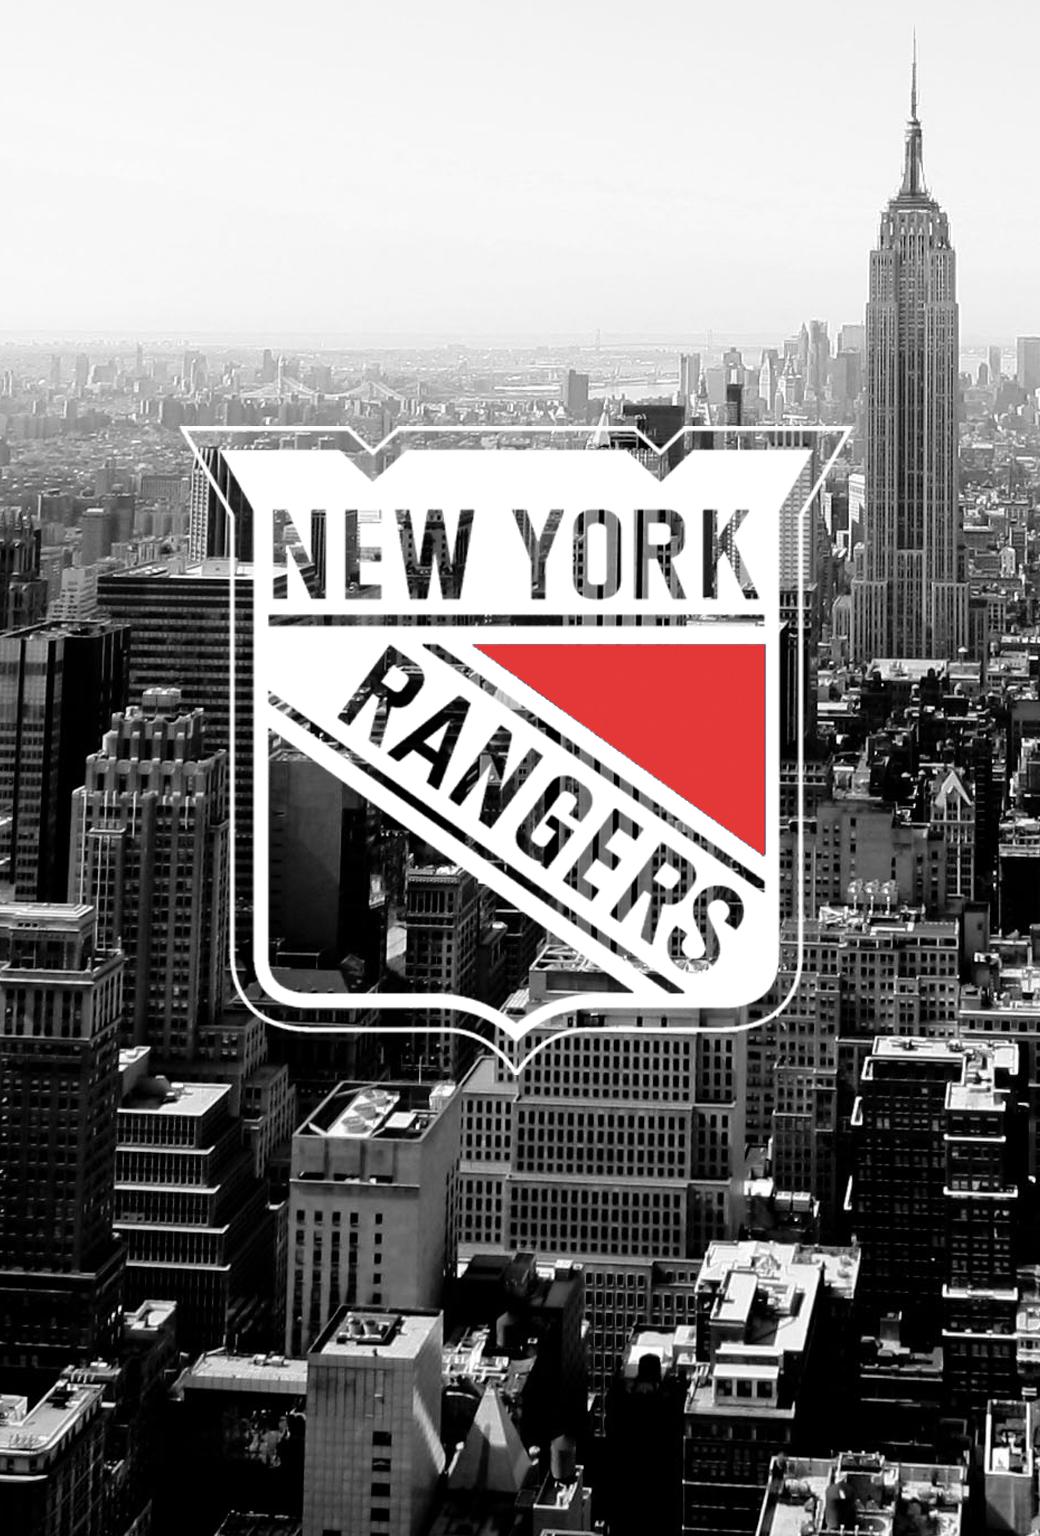 new york rangers wallpaper 1040x1536